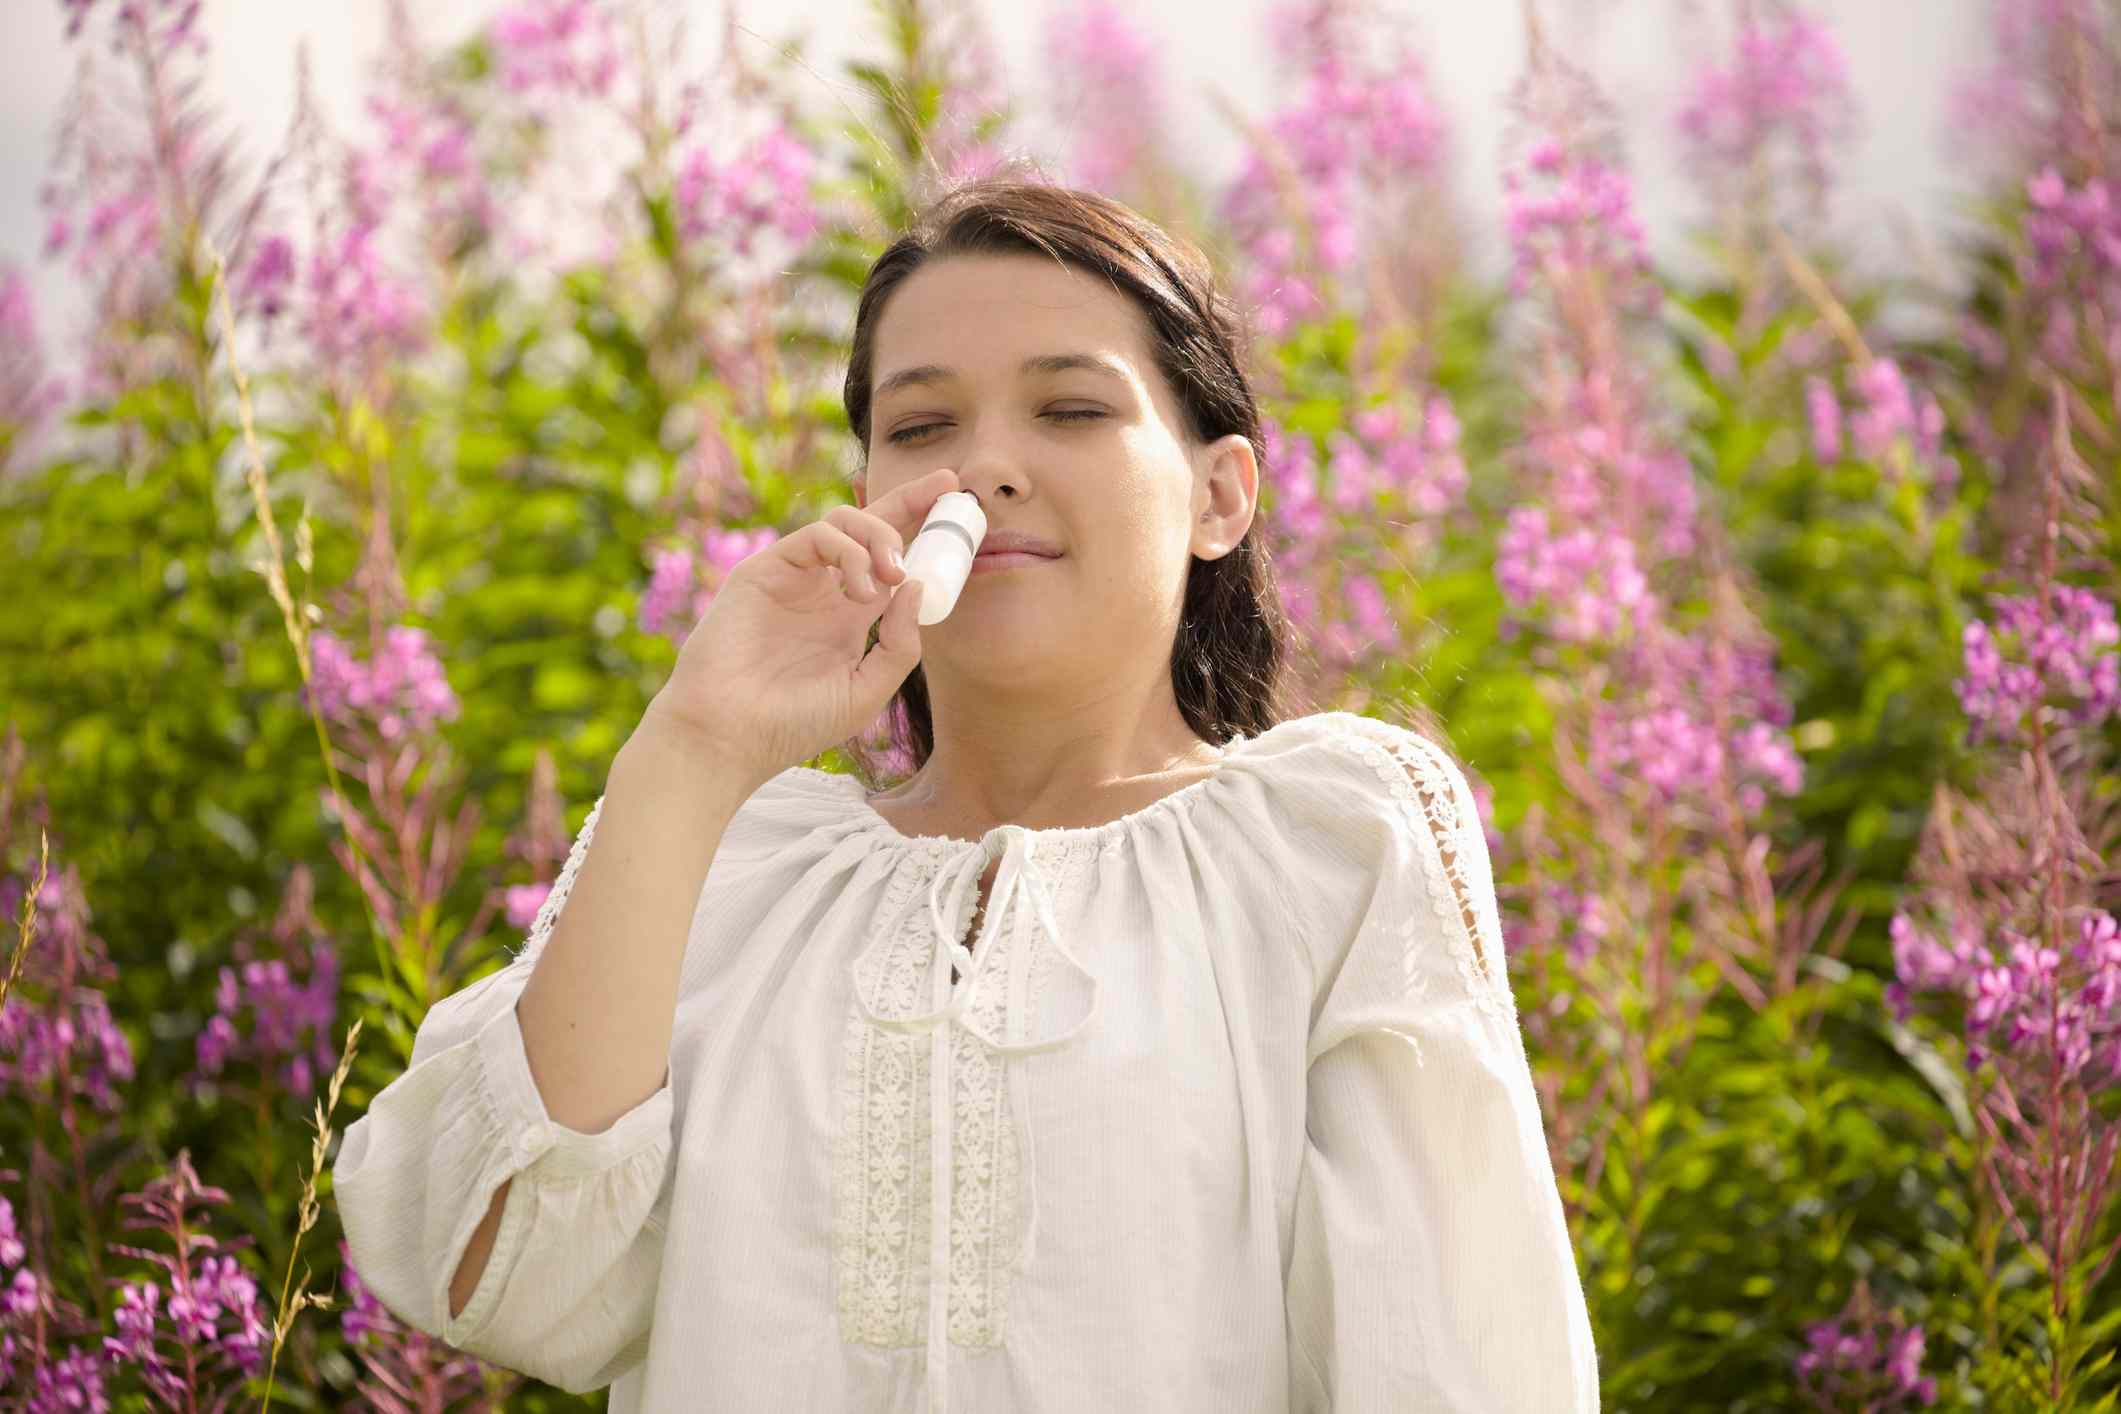 Woman using allergy relief nasal spray